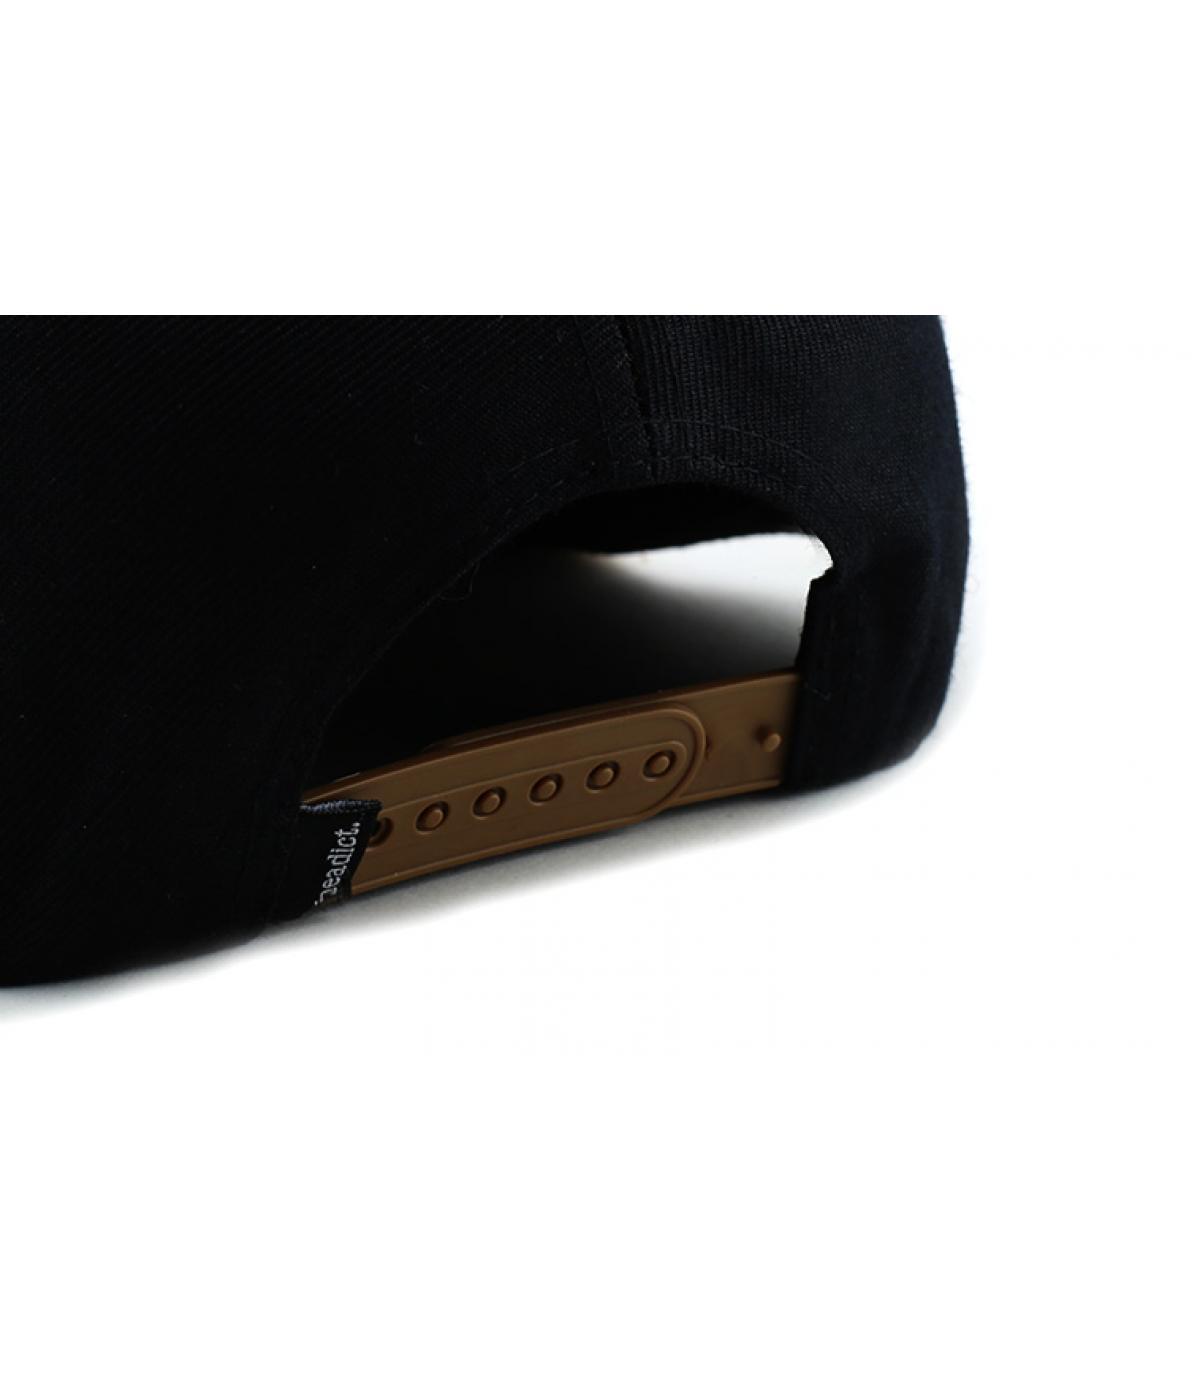 Dettagli Snapback Boobs Alert black brown - image 5